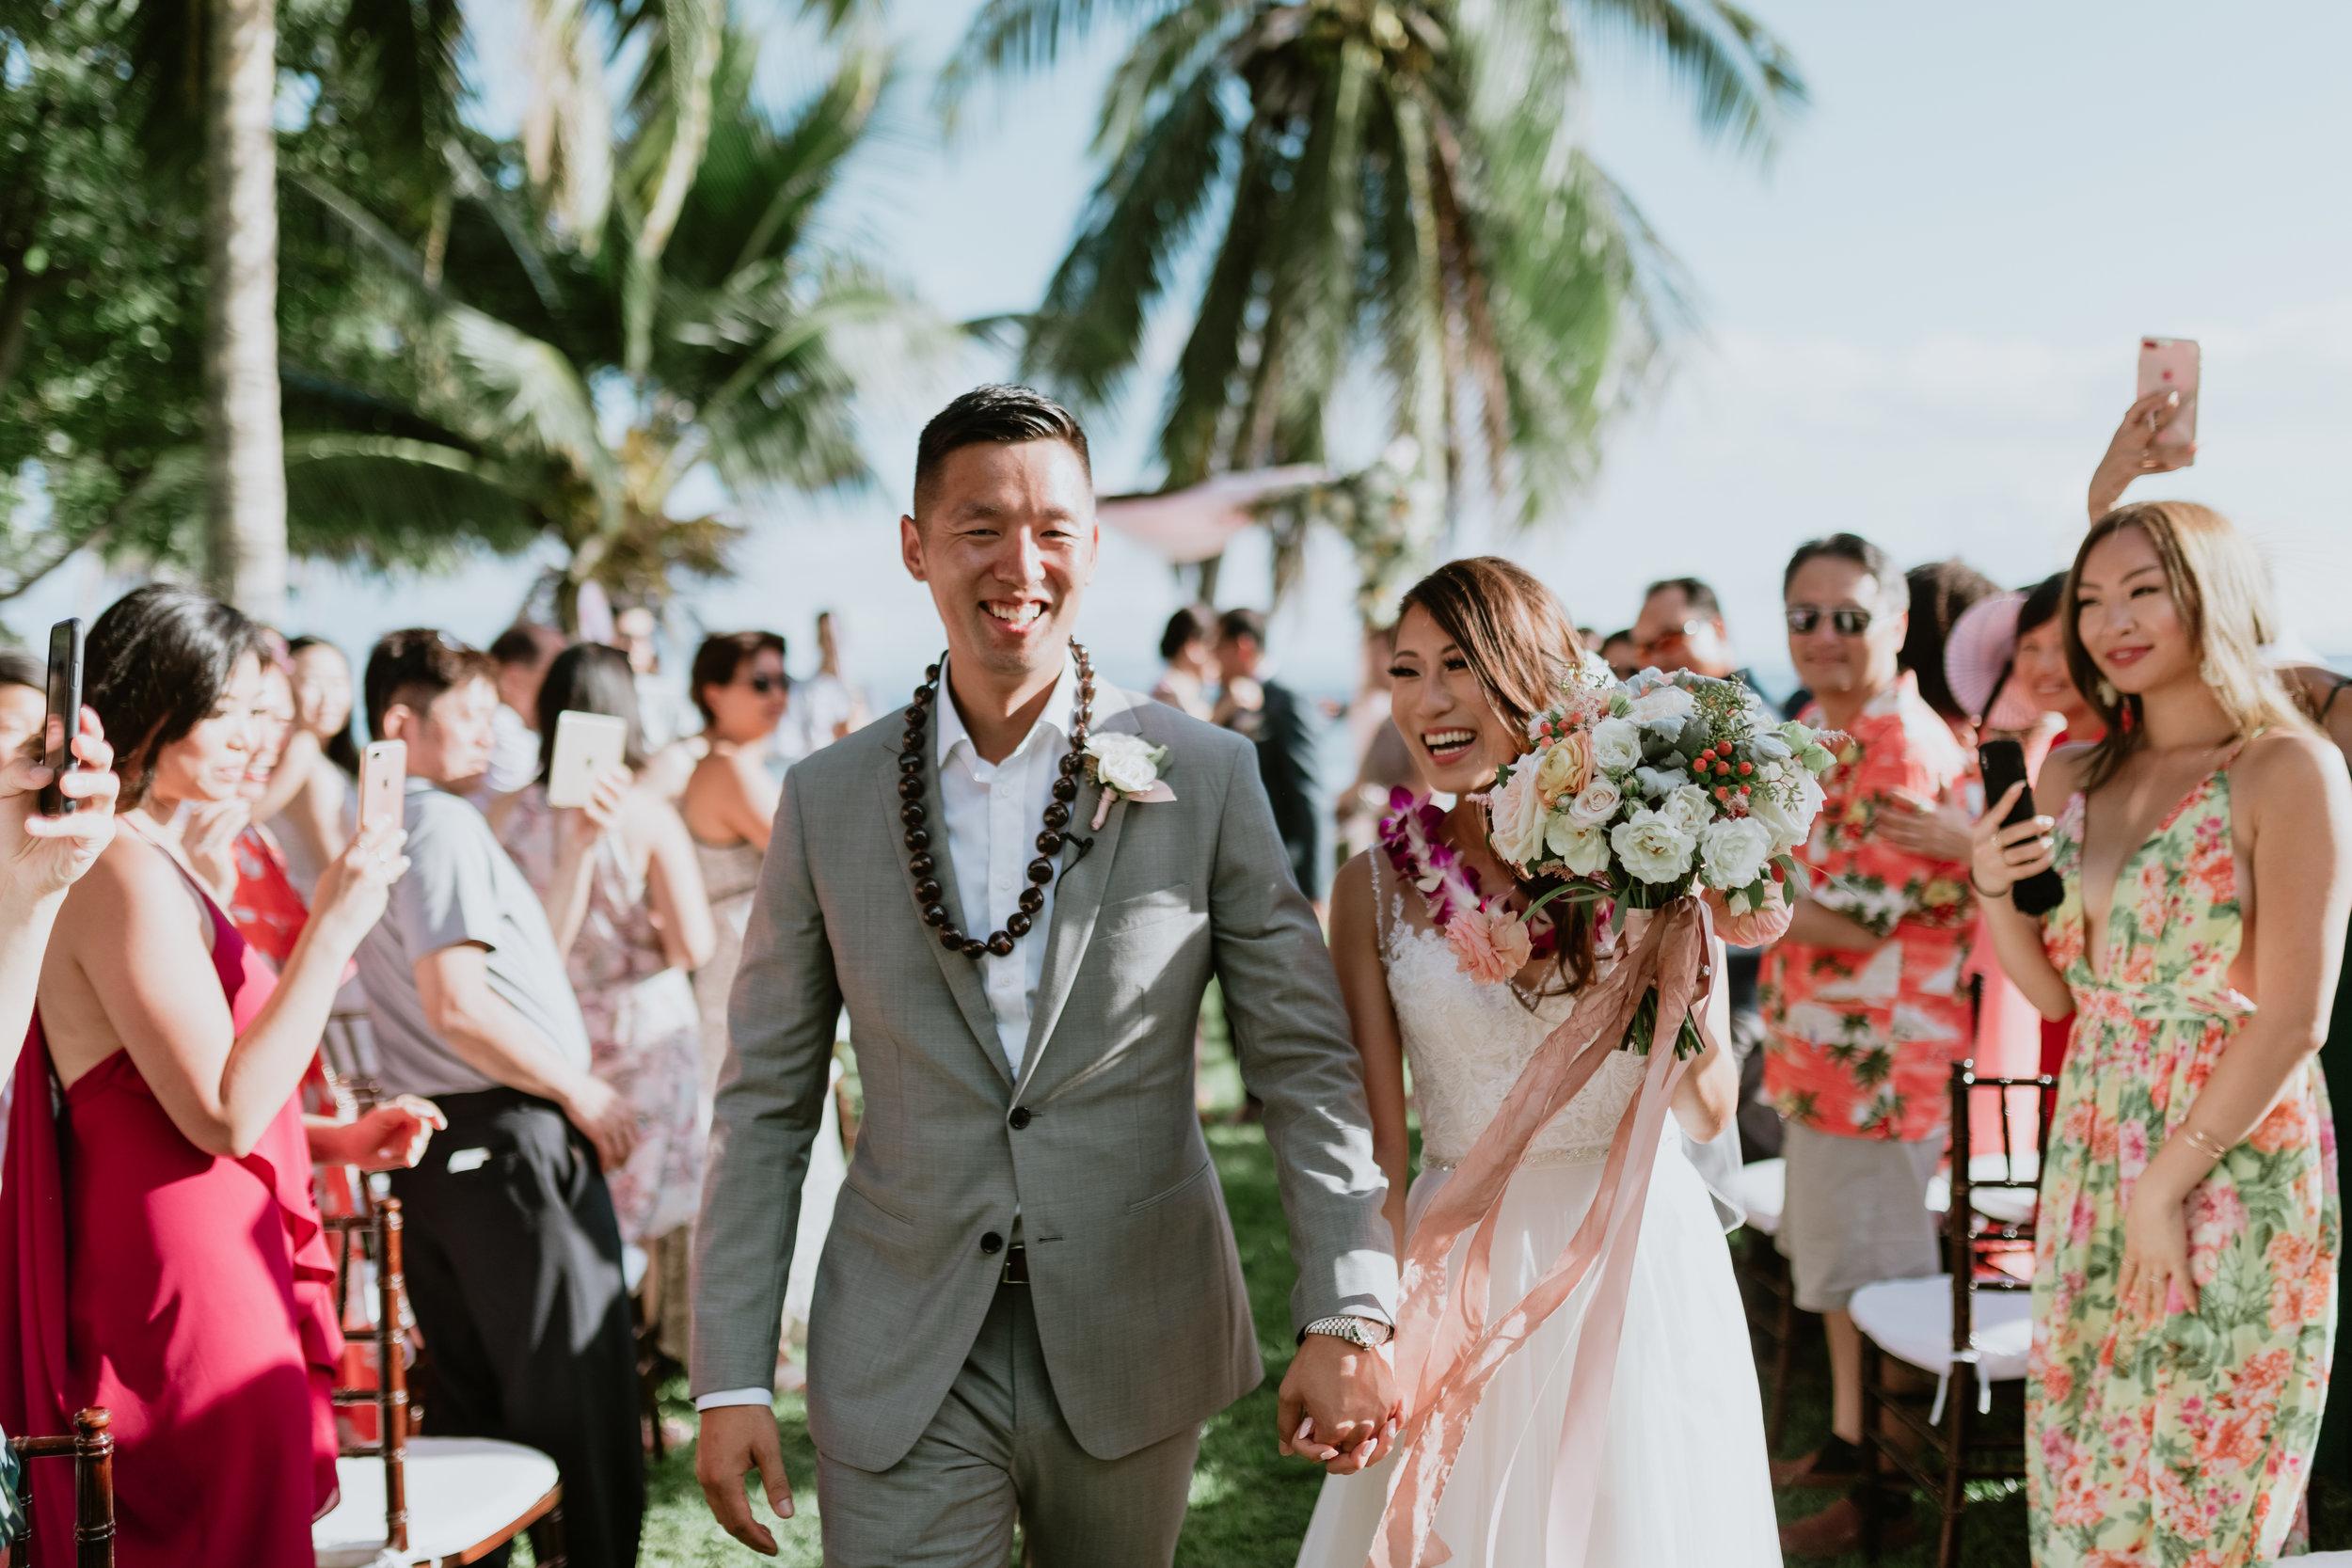 herastudios_wedding_carmen_jayjay_hera_selects-87.jpg